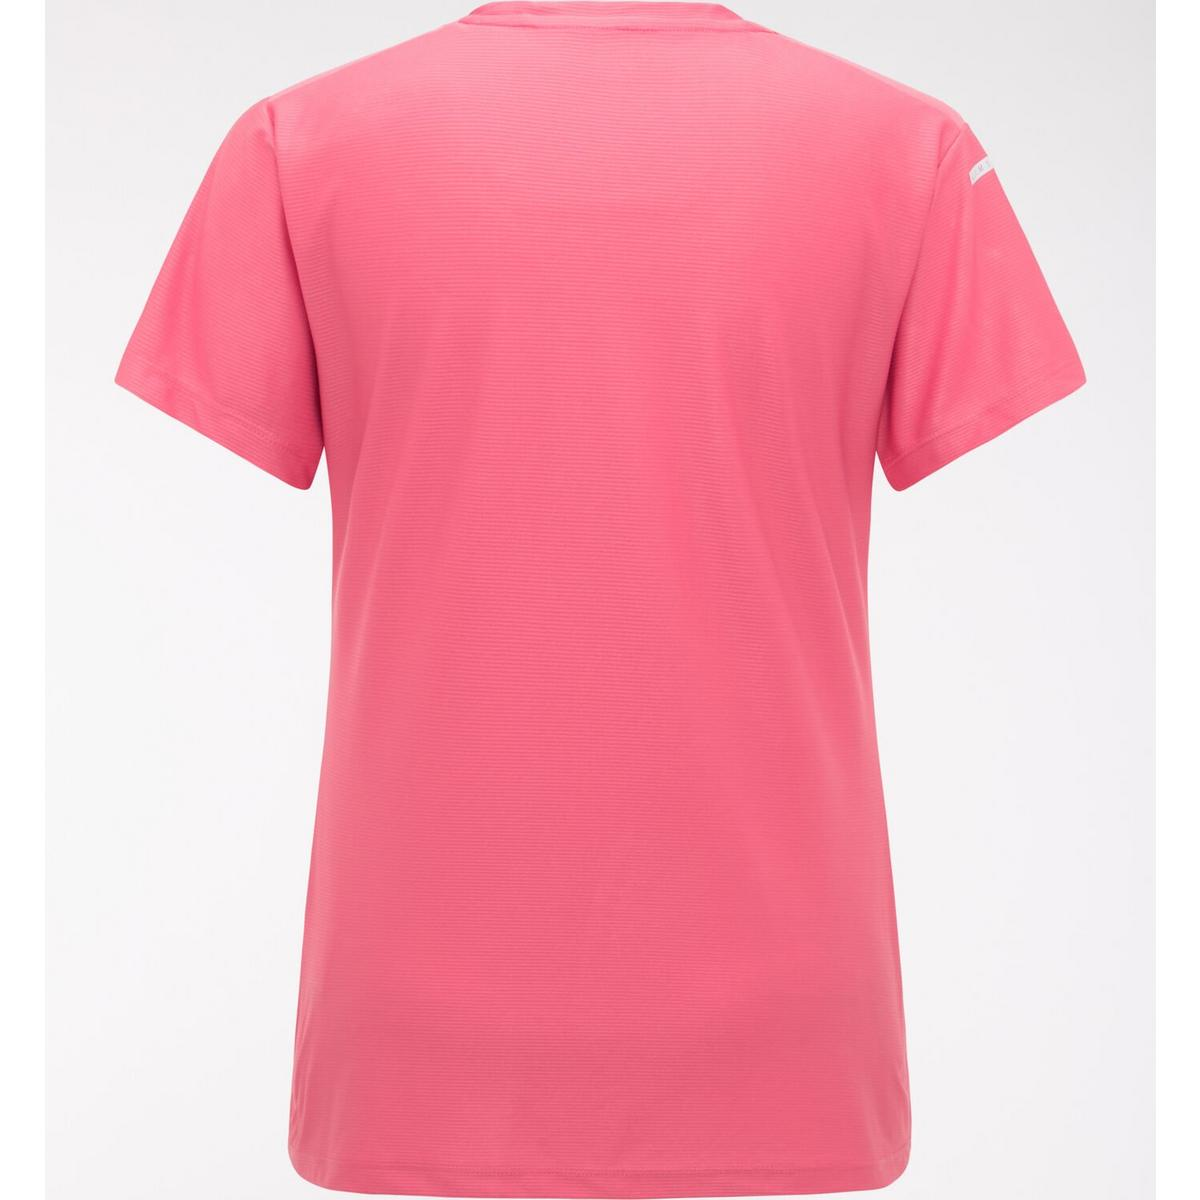 Haglofs Women's LIM Tech Tee - Tulip Pink